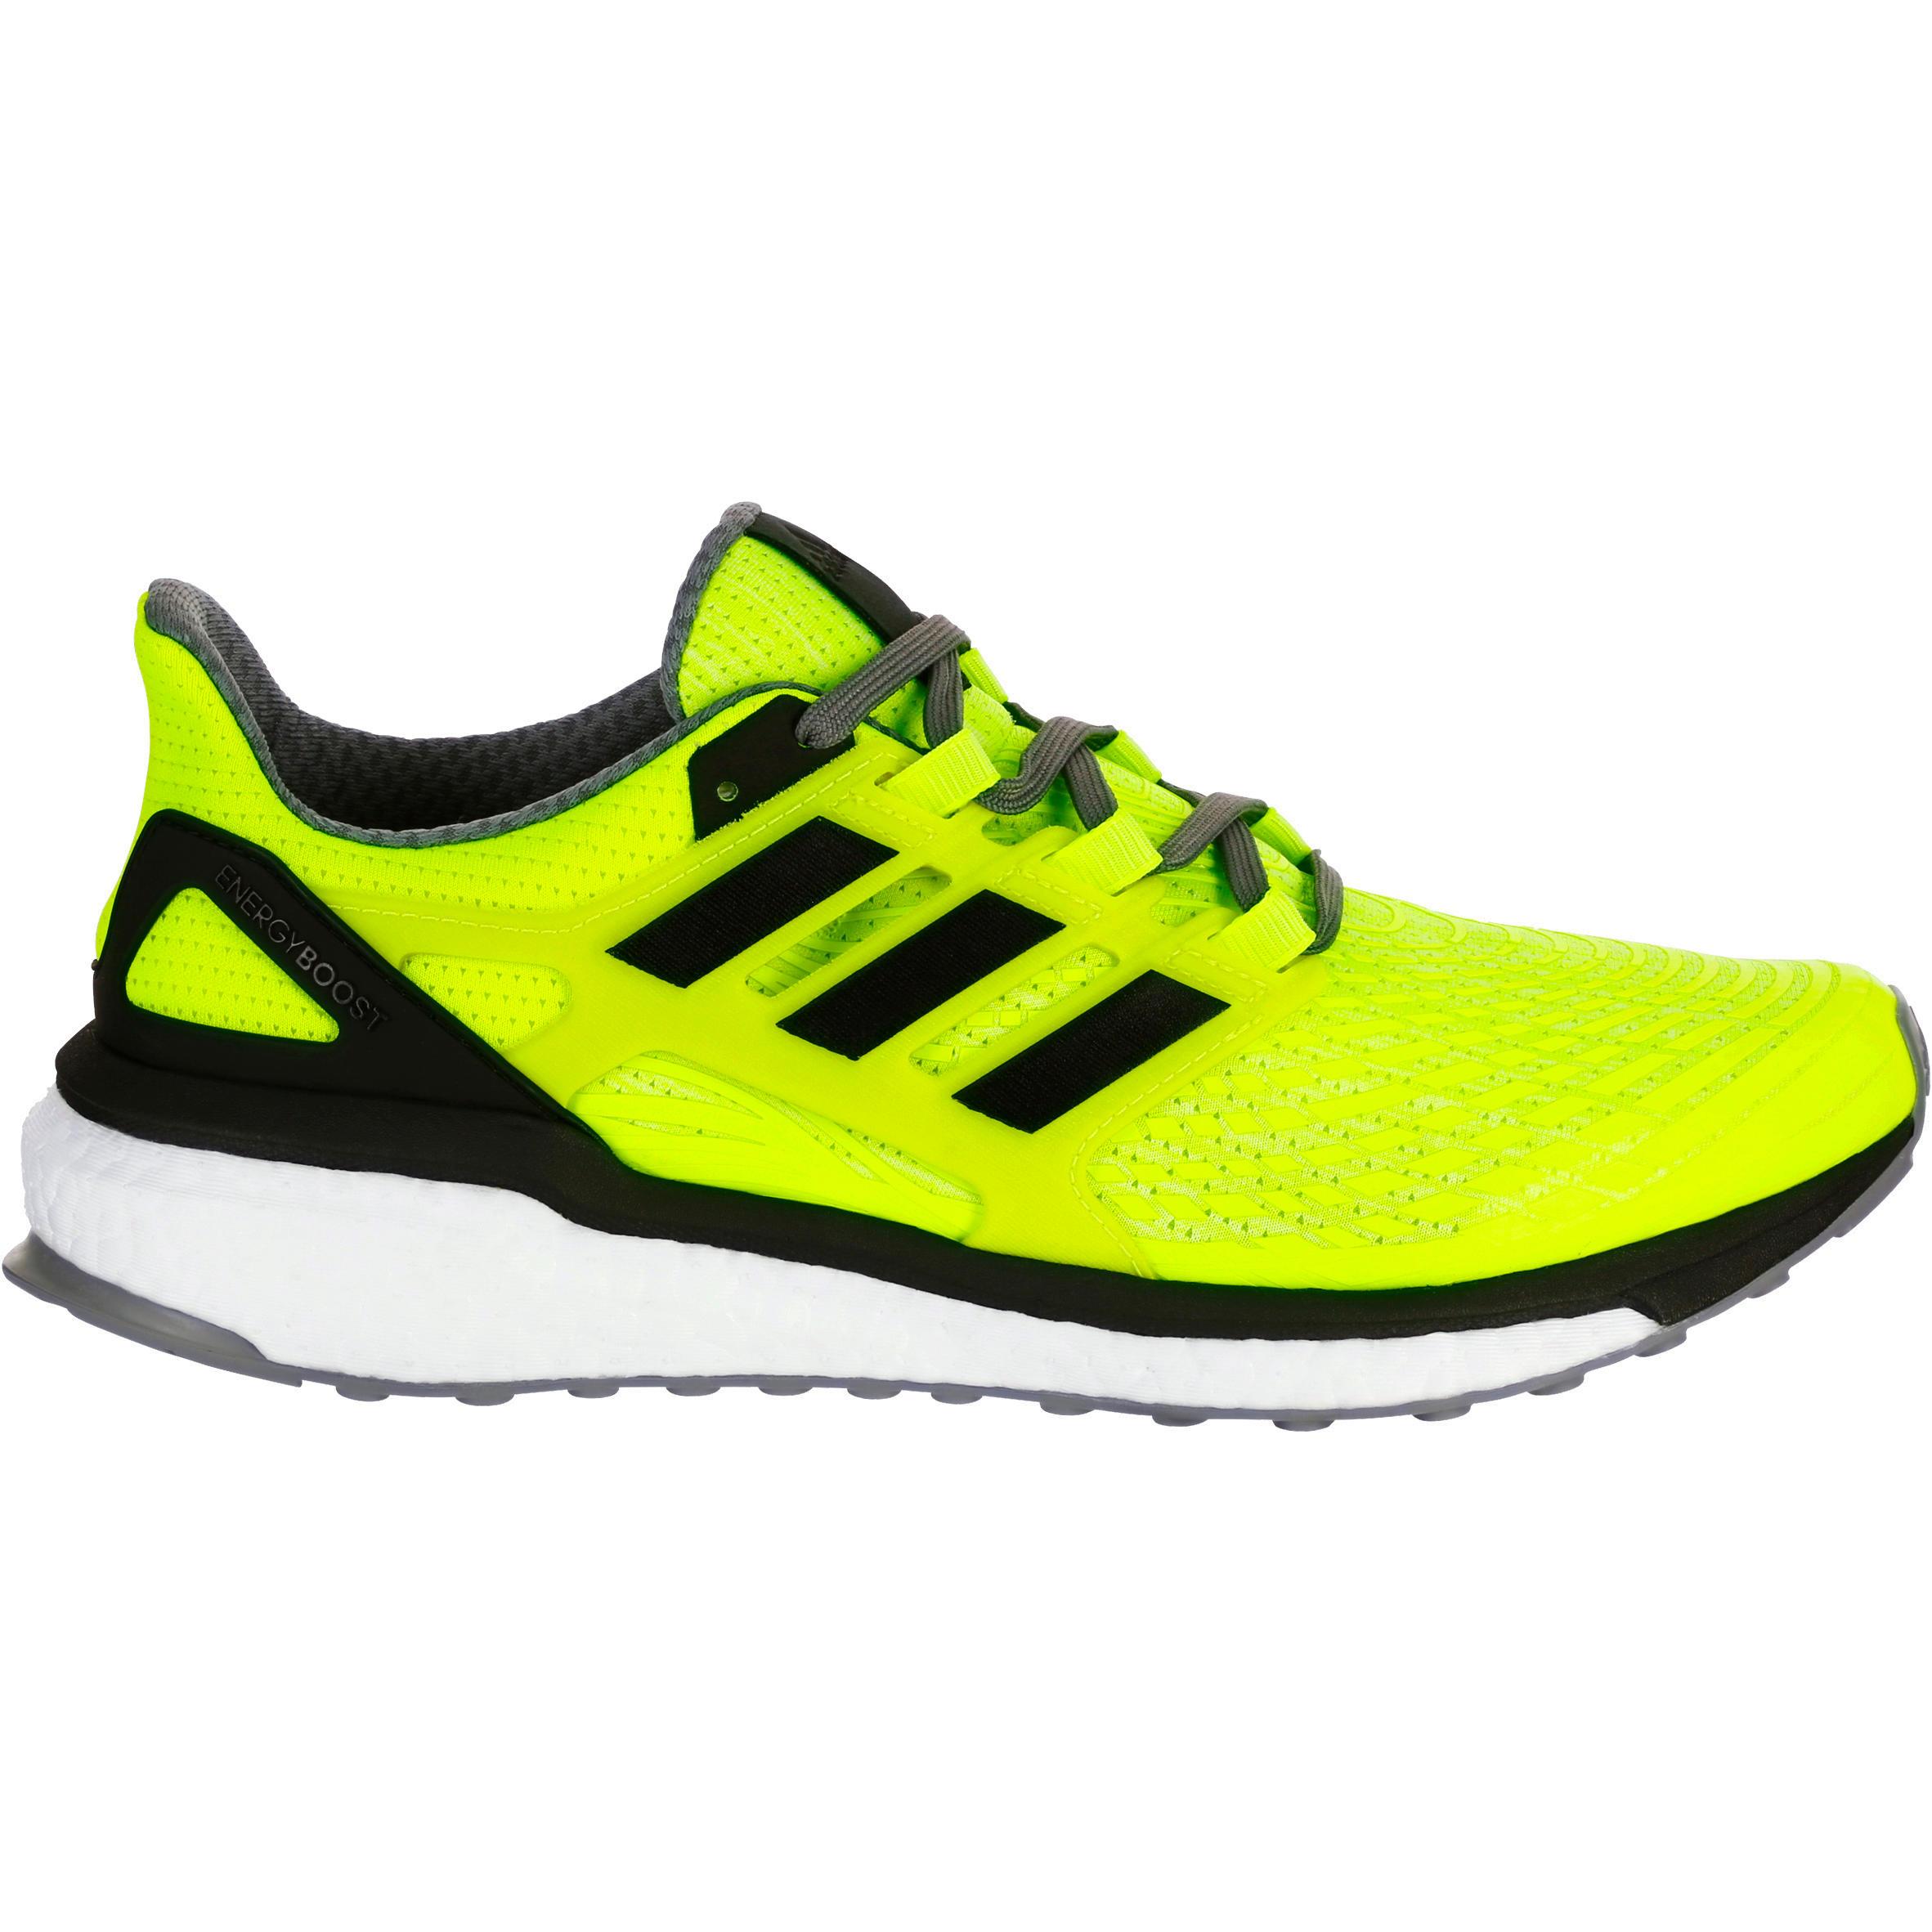 Jaune Adidas Homme Chaussure Boost Energy 3 Running kOZuTPXi